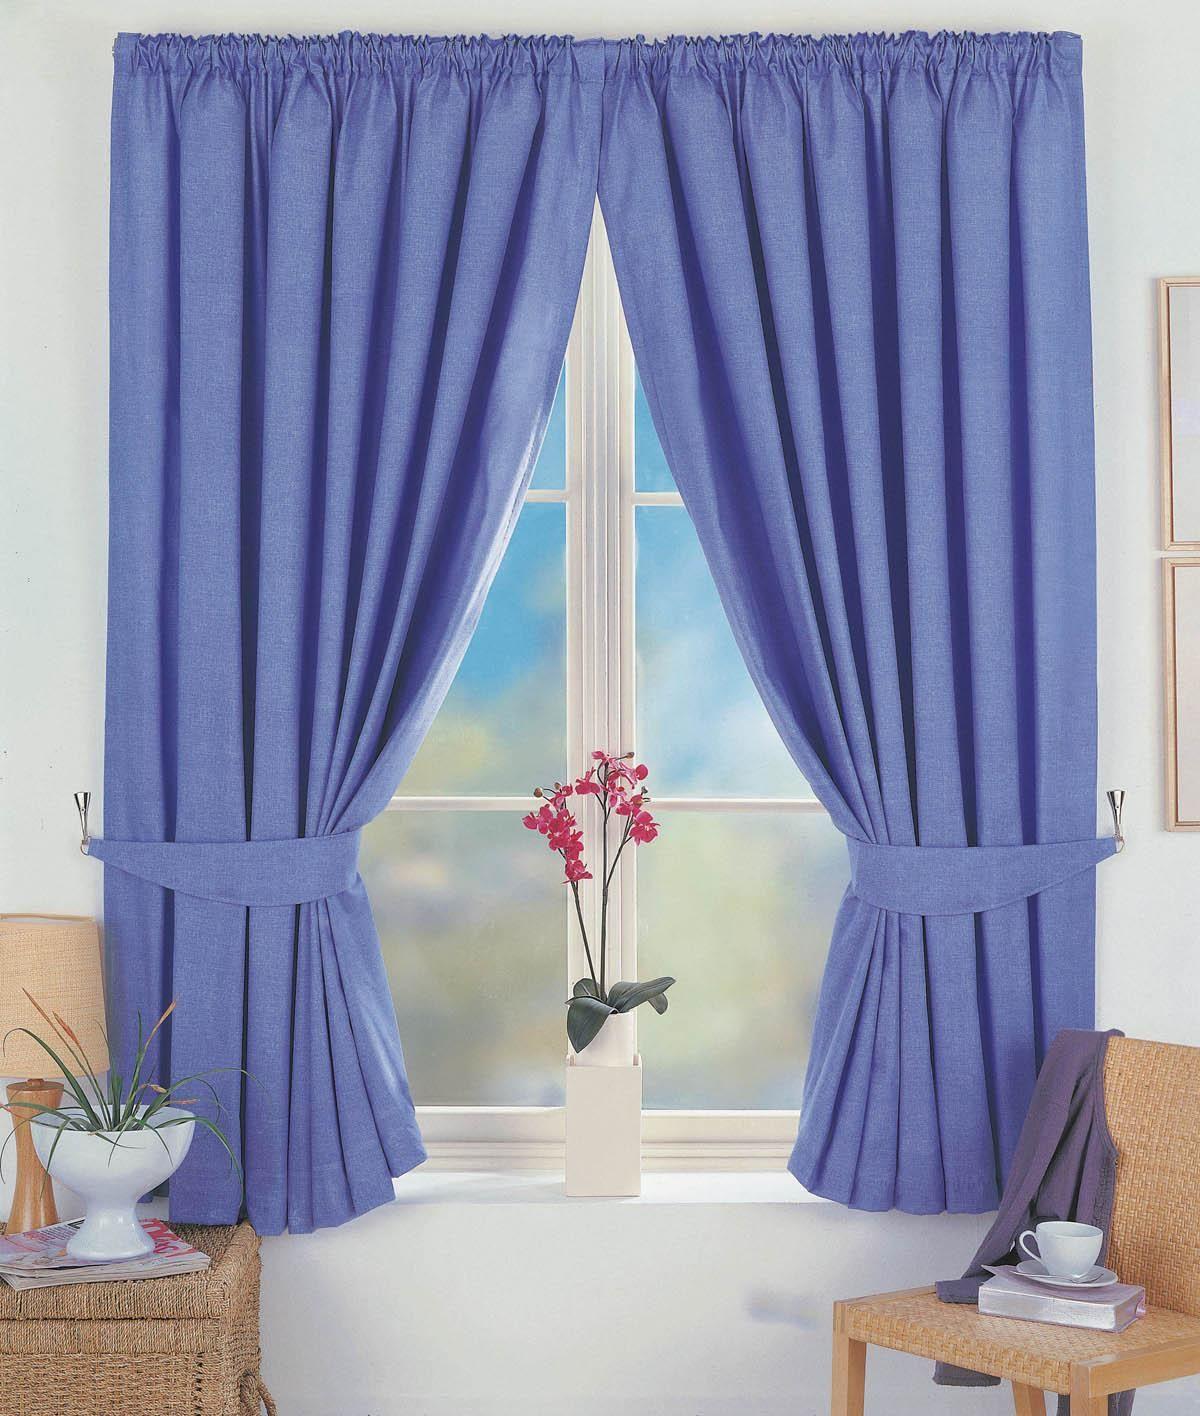 Short Curtains In Nursery At DuckDuckGo